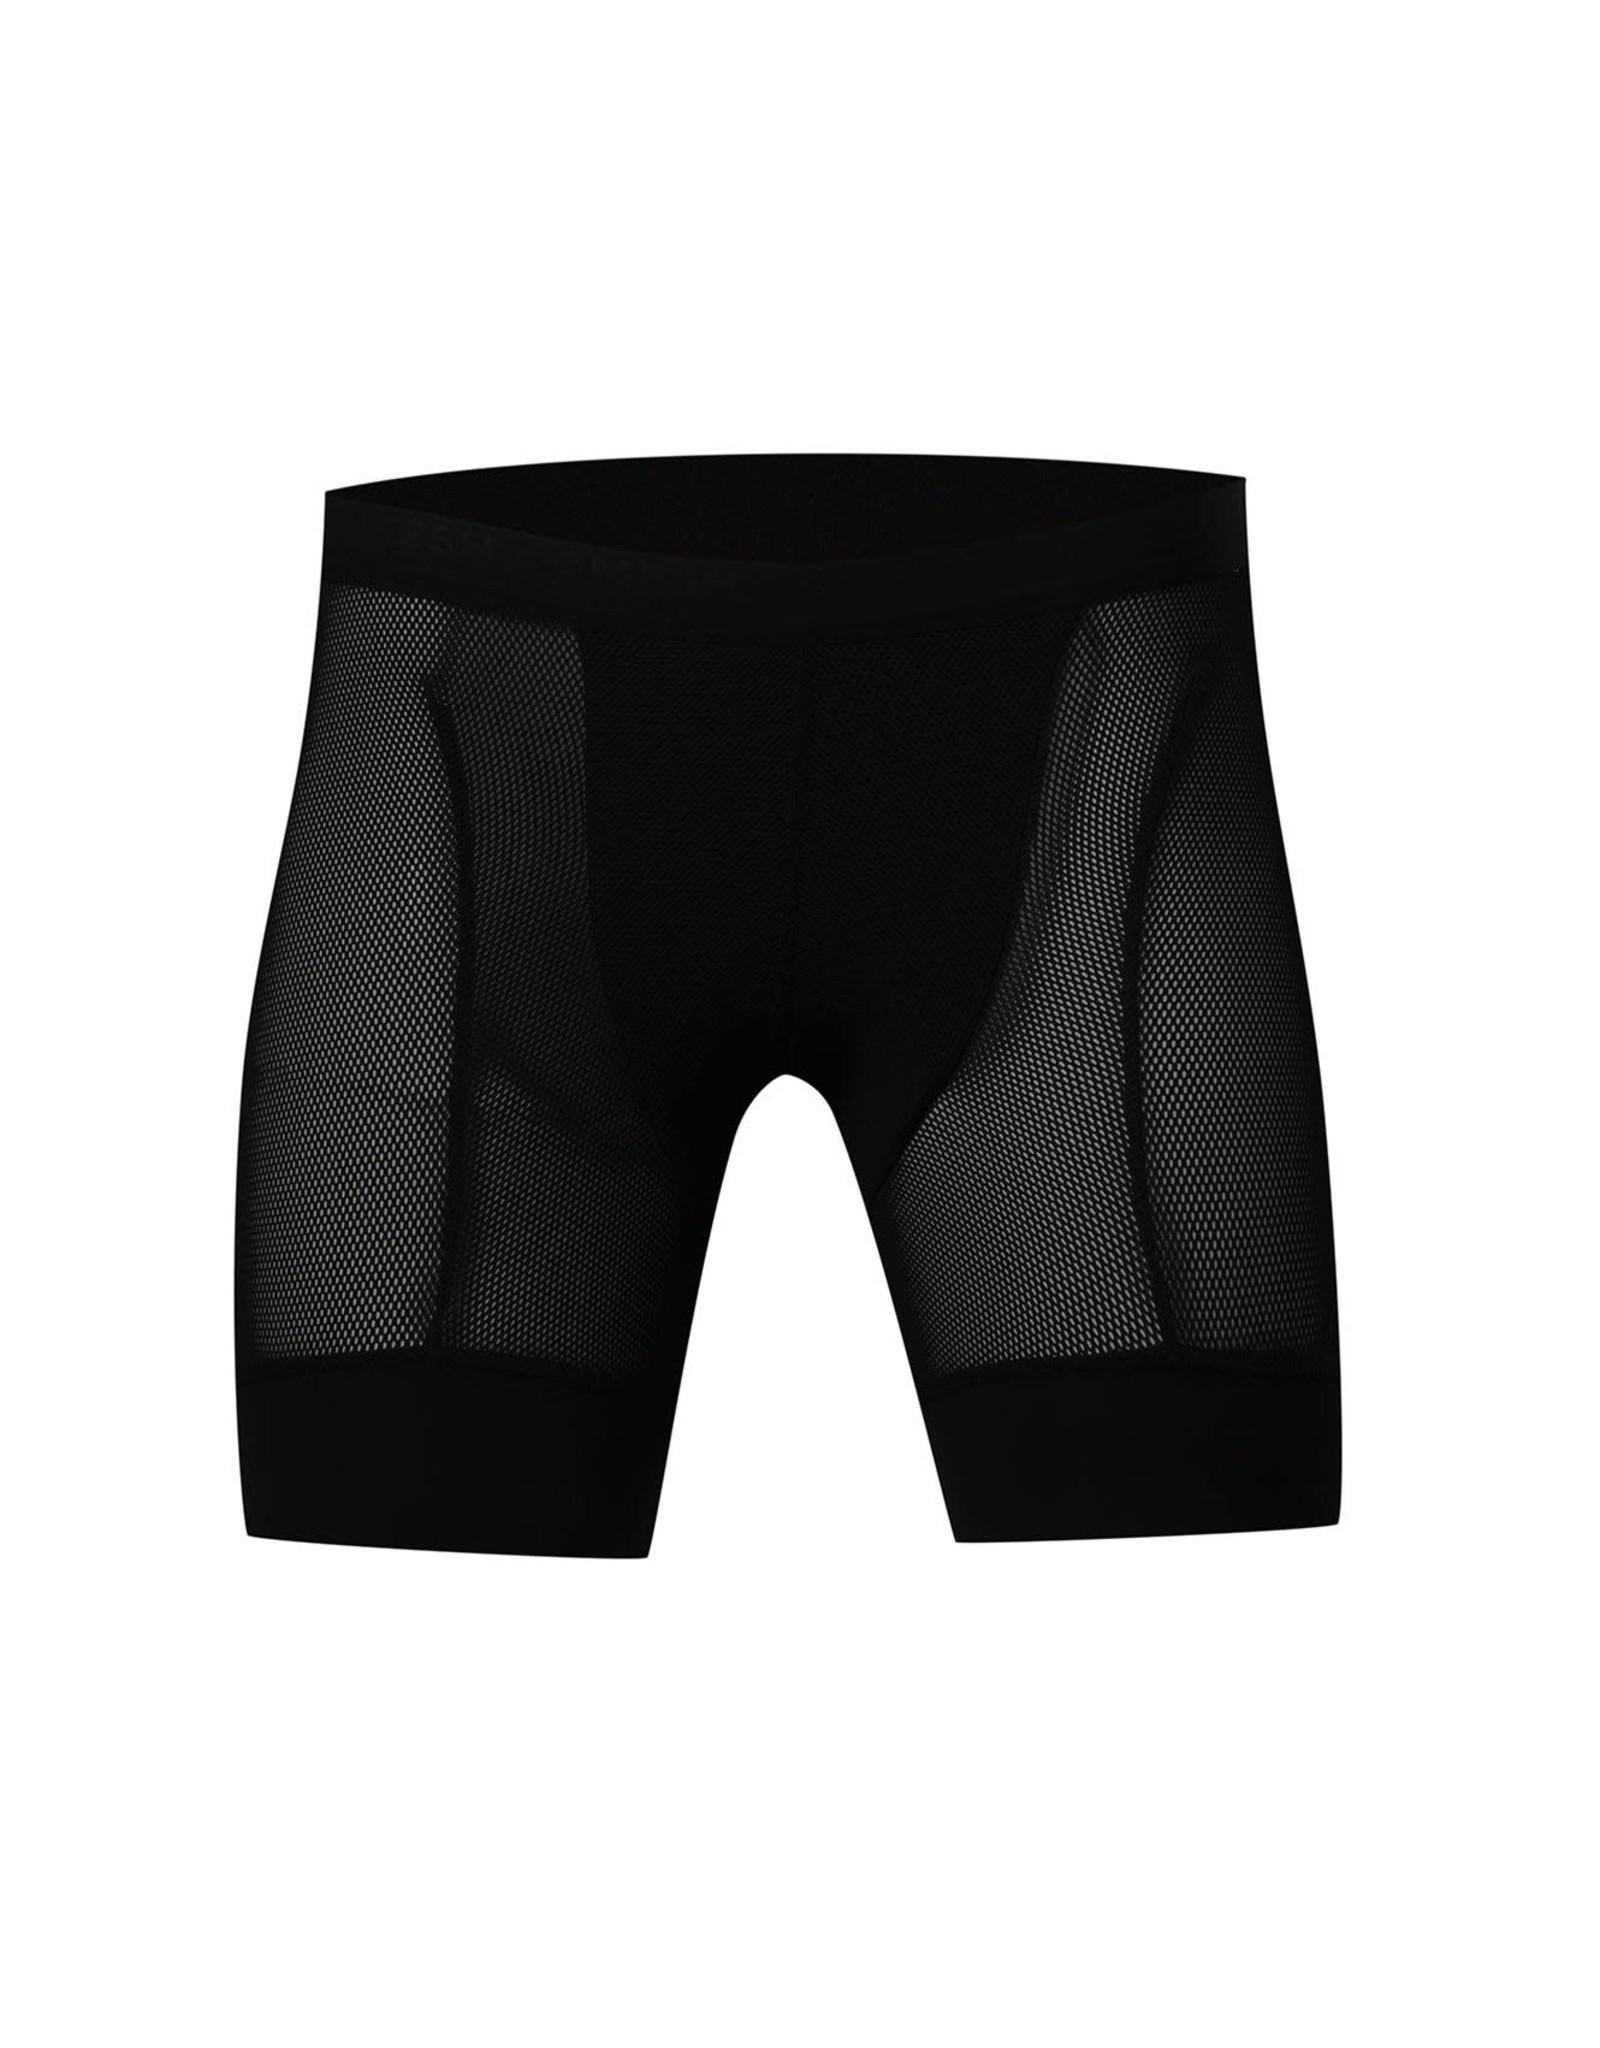 7MESH 7MESH - Foundation Shorts Womens XS